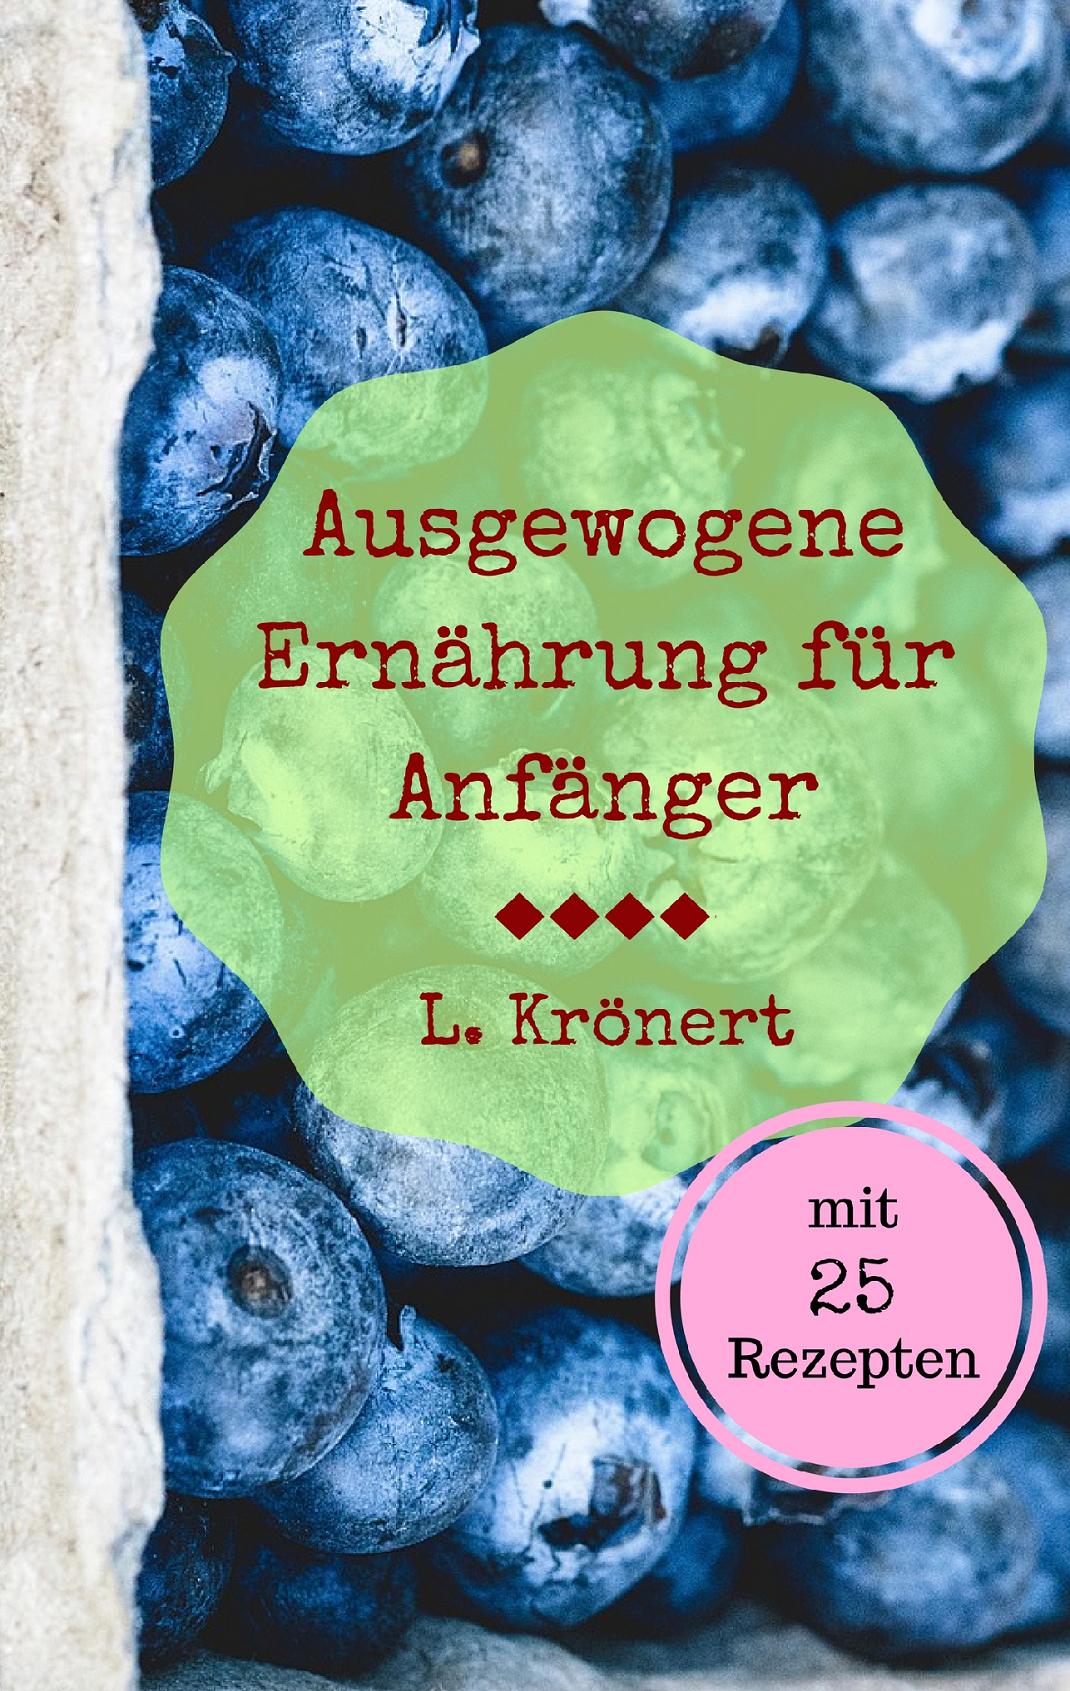 L. Krönert – Ausgewogene Ernährung für Anfänger